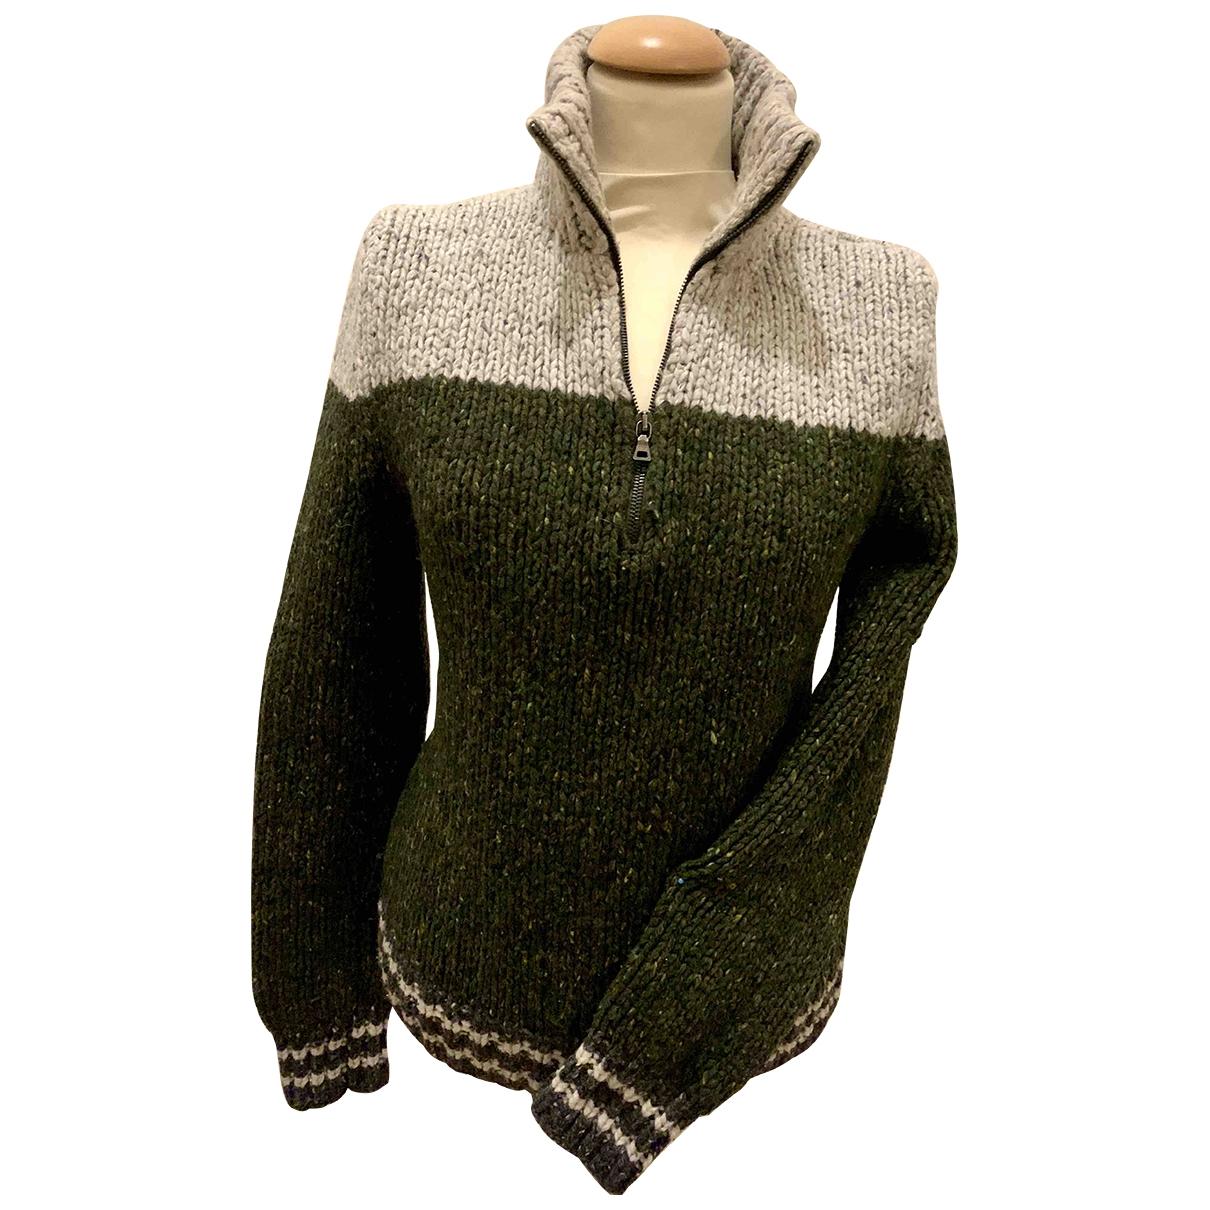 Prada - Pull   pour femme en laine - multicolore